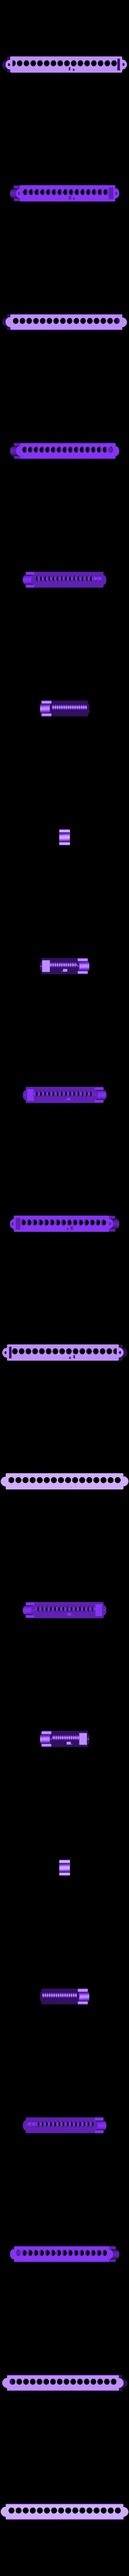 soportes_luces3.STL Download free STL file TSPC RACER REV LIGHTS w SIMHUB • 3D print template, danzig483